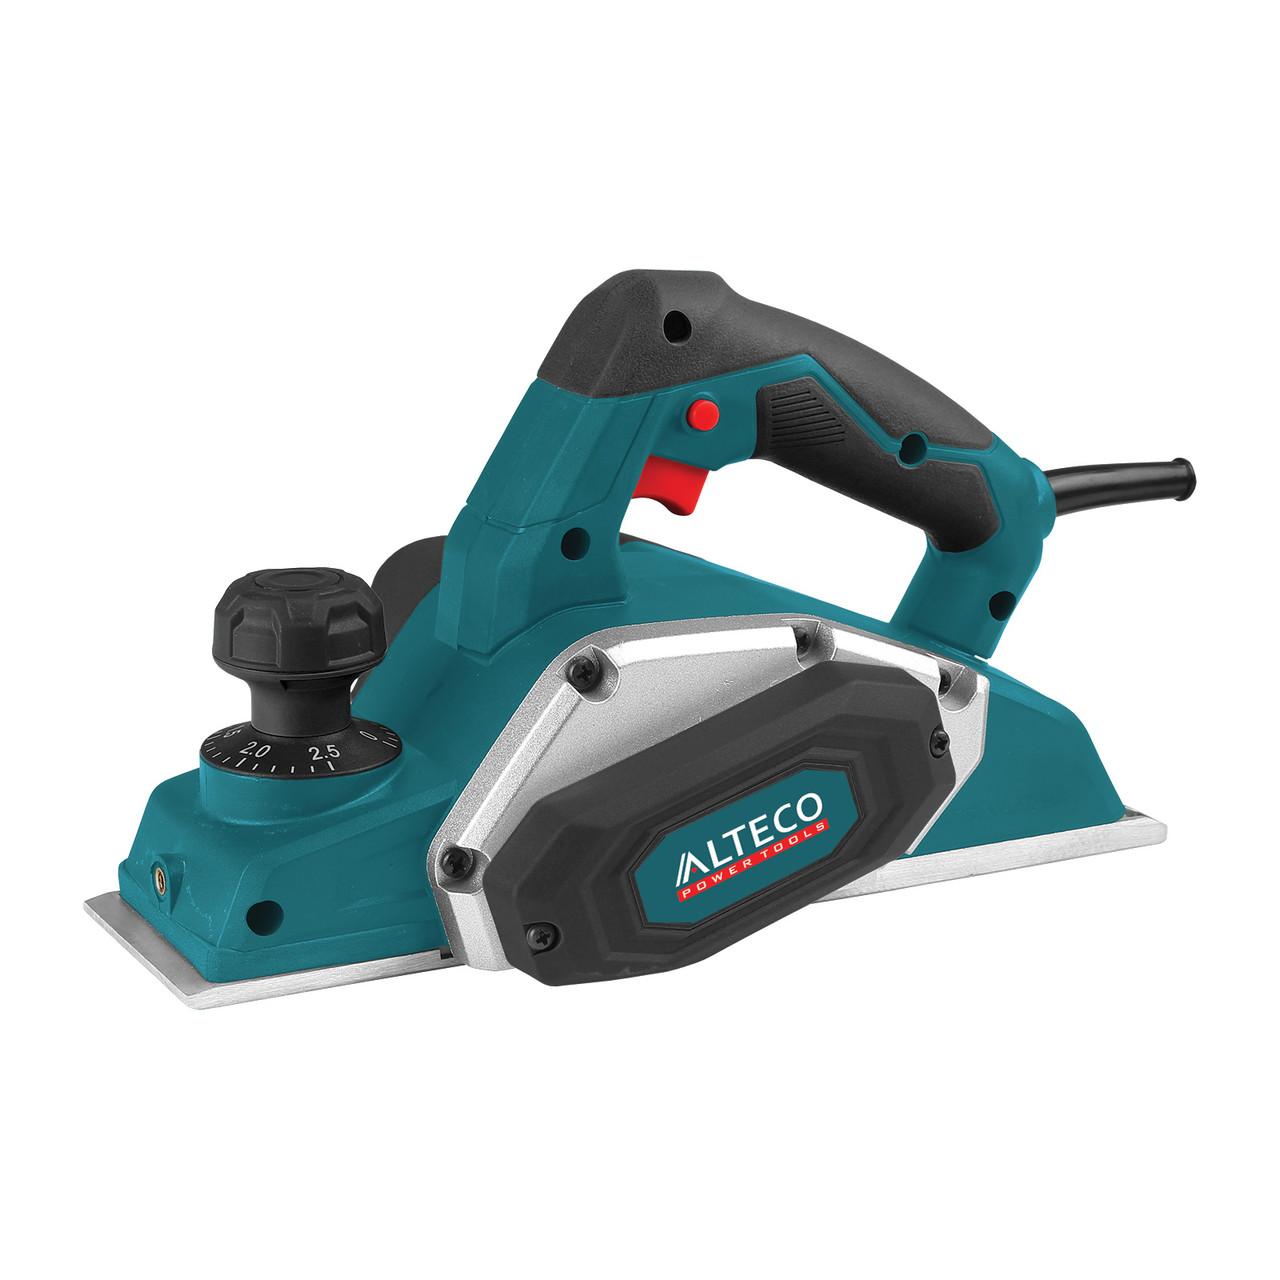 Рубанок электрический ALTECO PL 650 650Вт 17000об/мин нож 82мм сред до 2.5мм